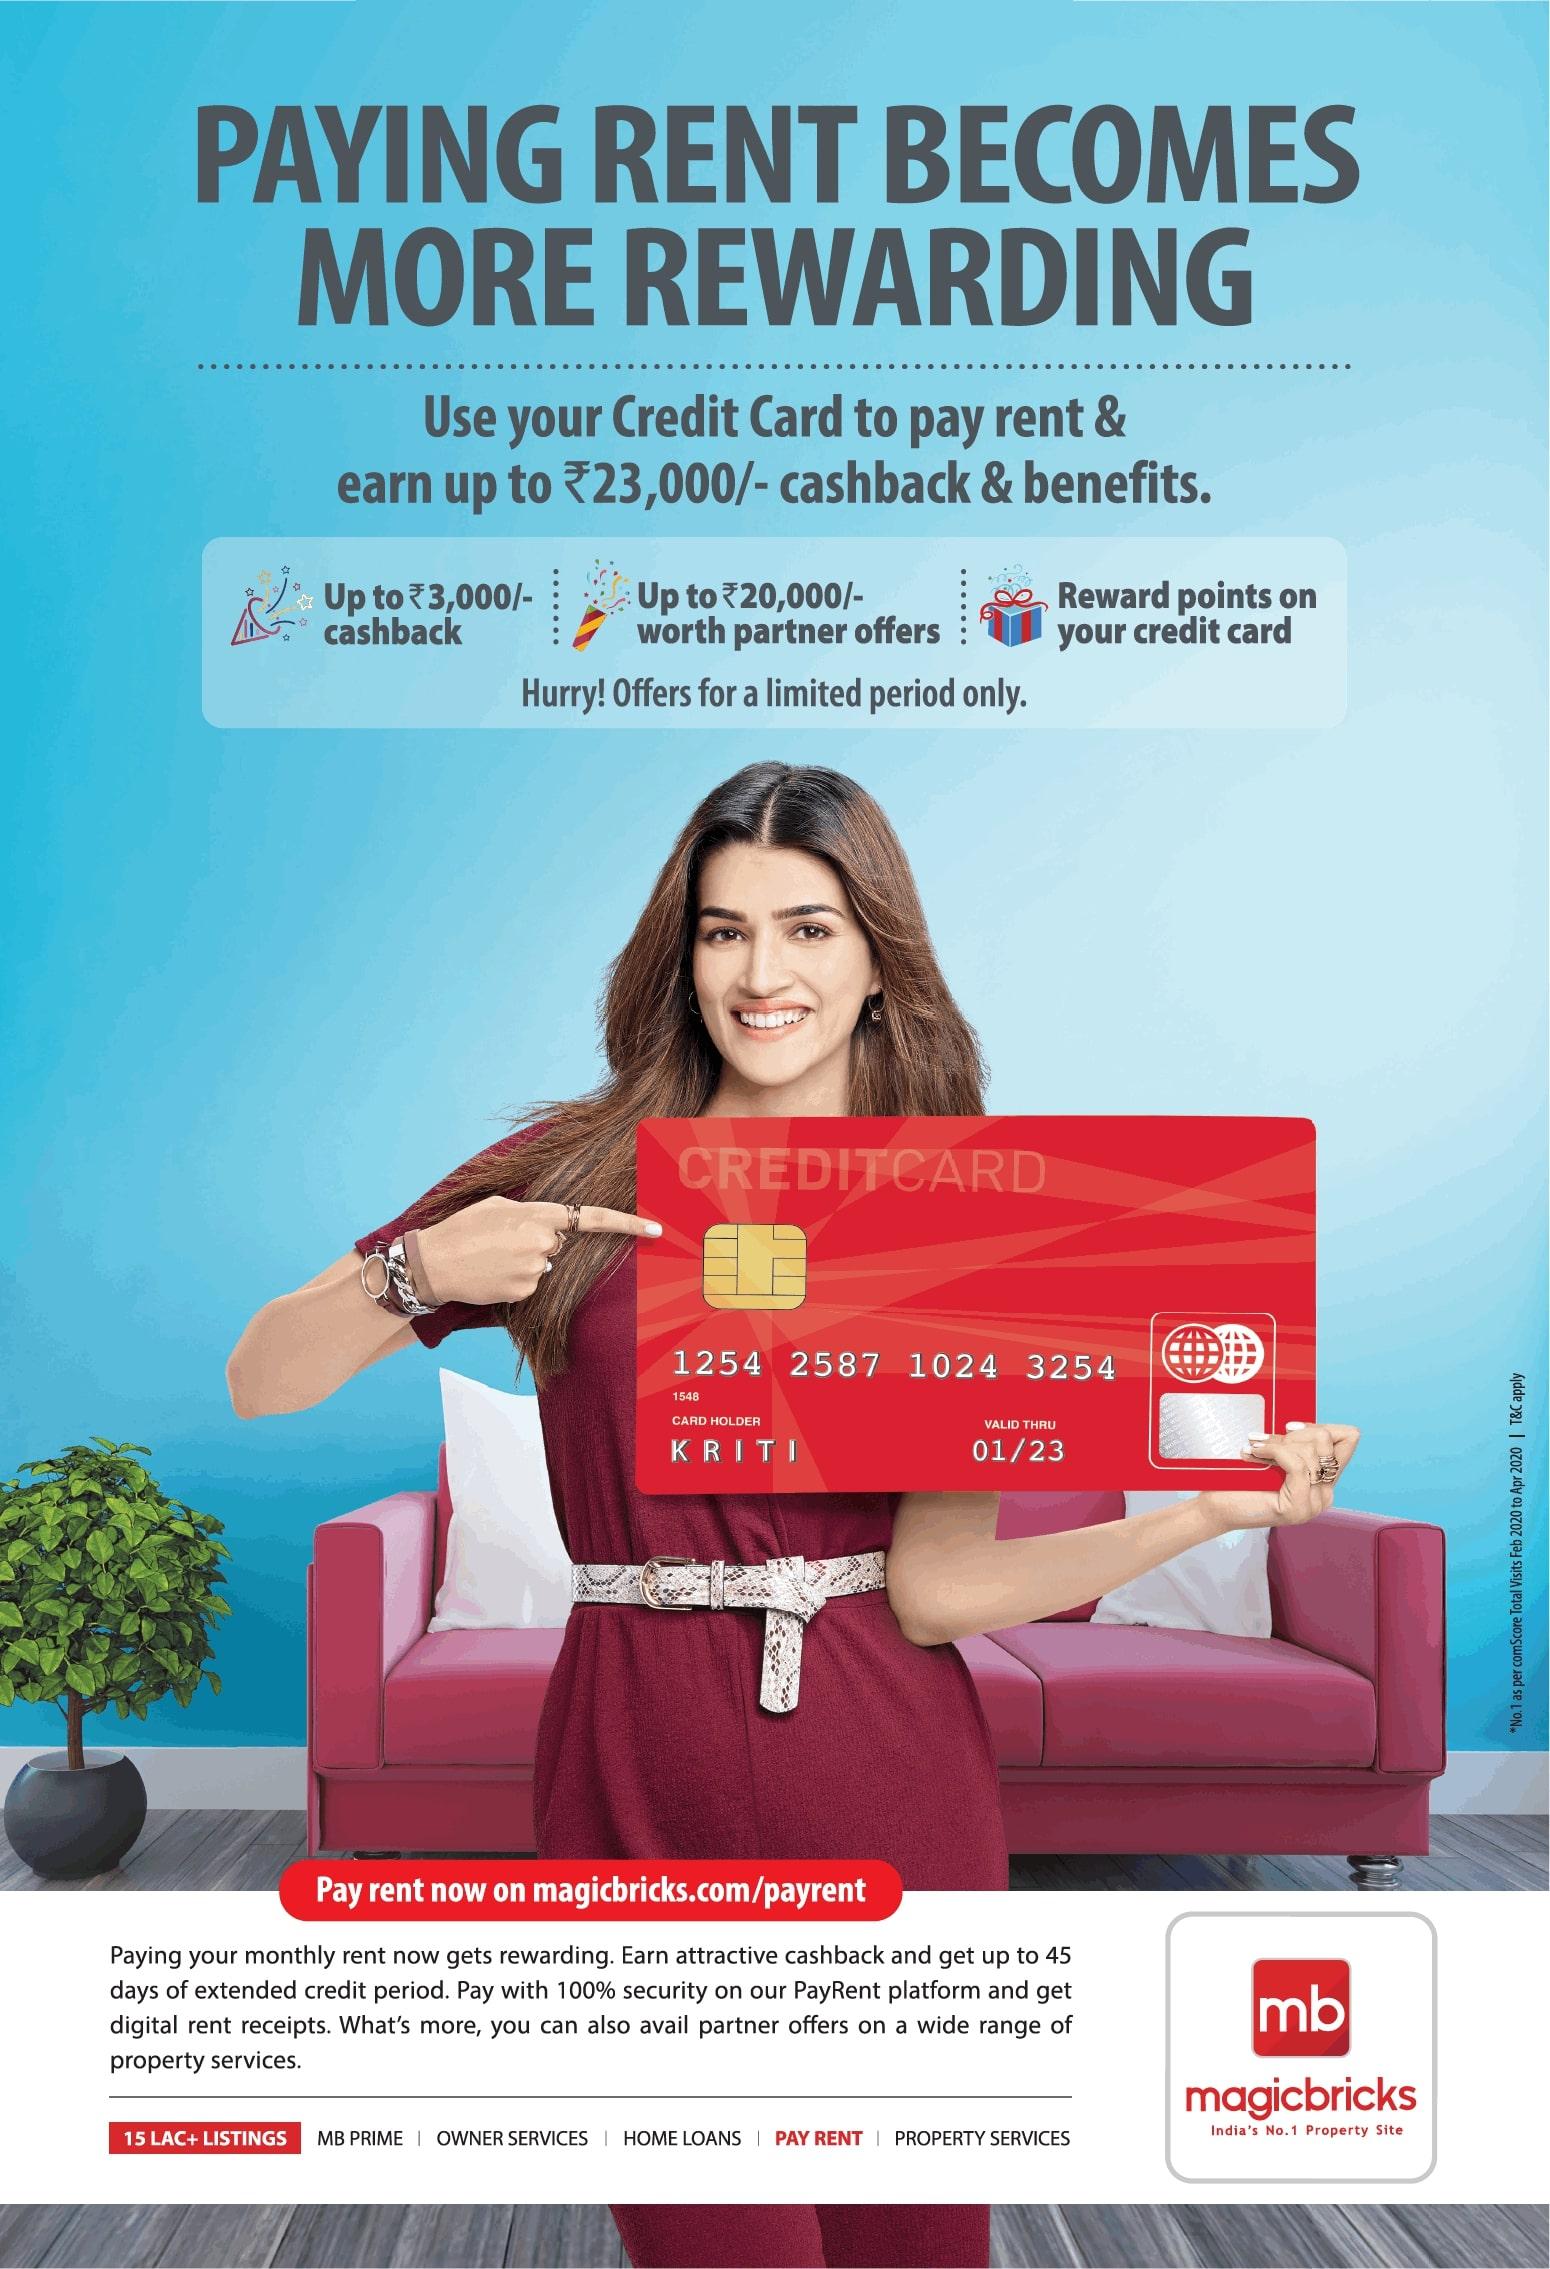 magicbricks-paying-rent-becomes-more-rewarding-ad-times-of-india-mumbai-02-06-2021